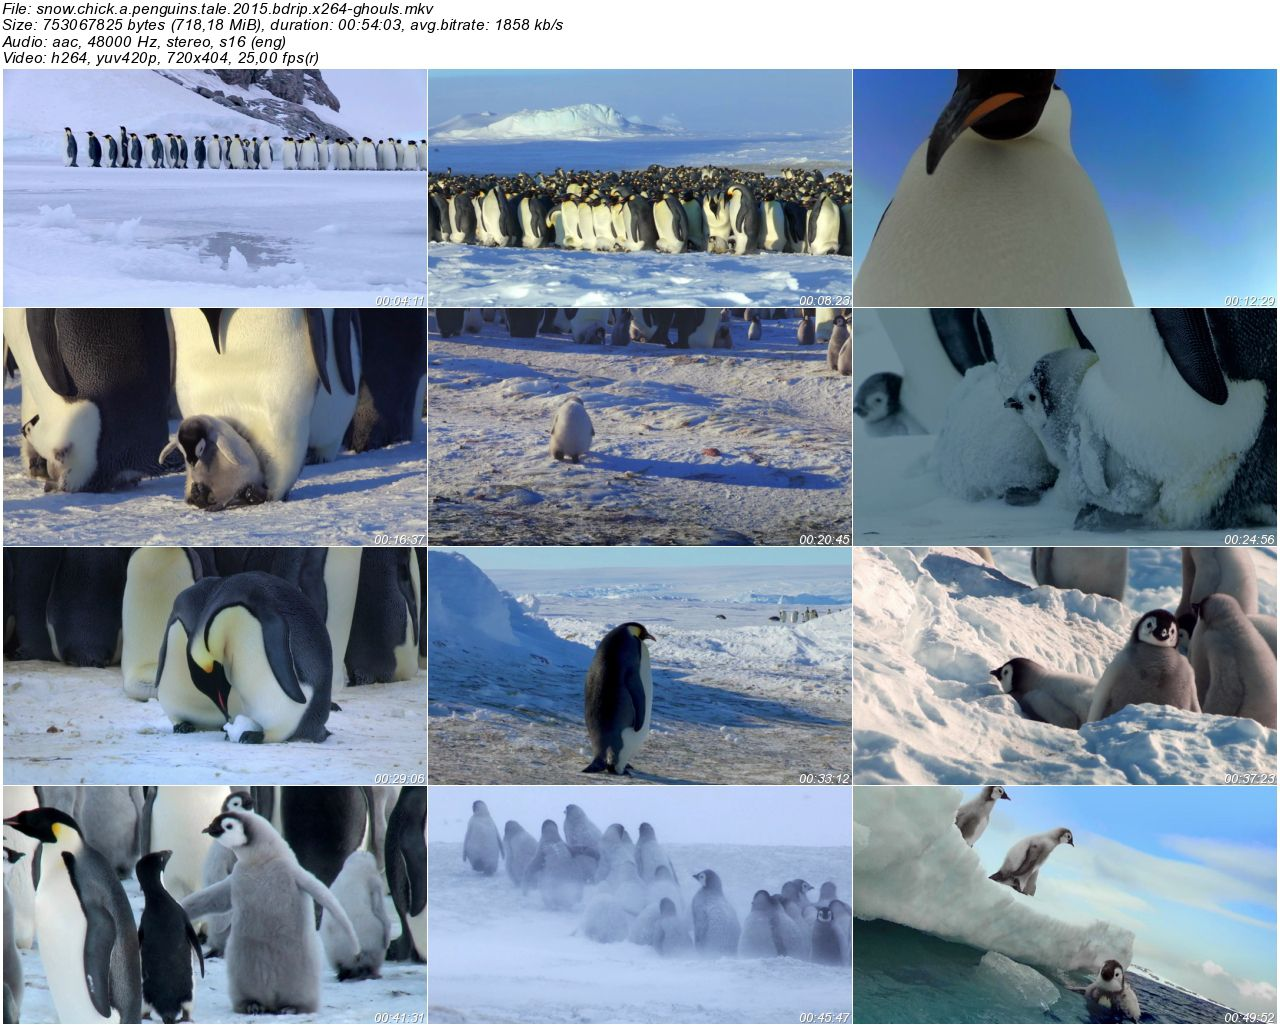 Snow Chick A Penguins Tale - 2015 BDRip x264 - Türkçe Altyazılı Tek Link indir